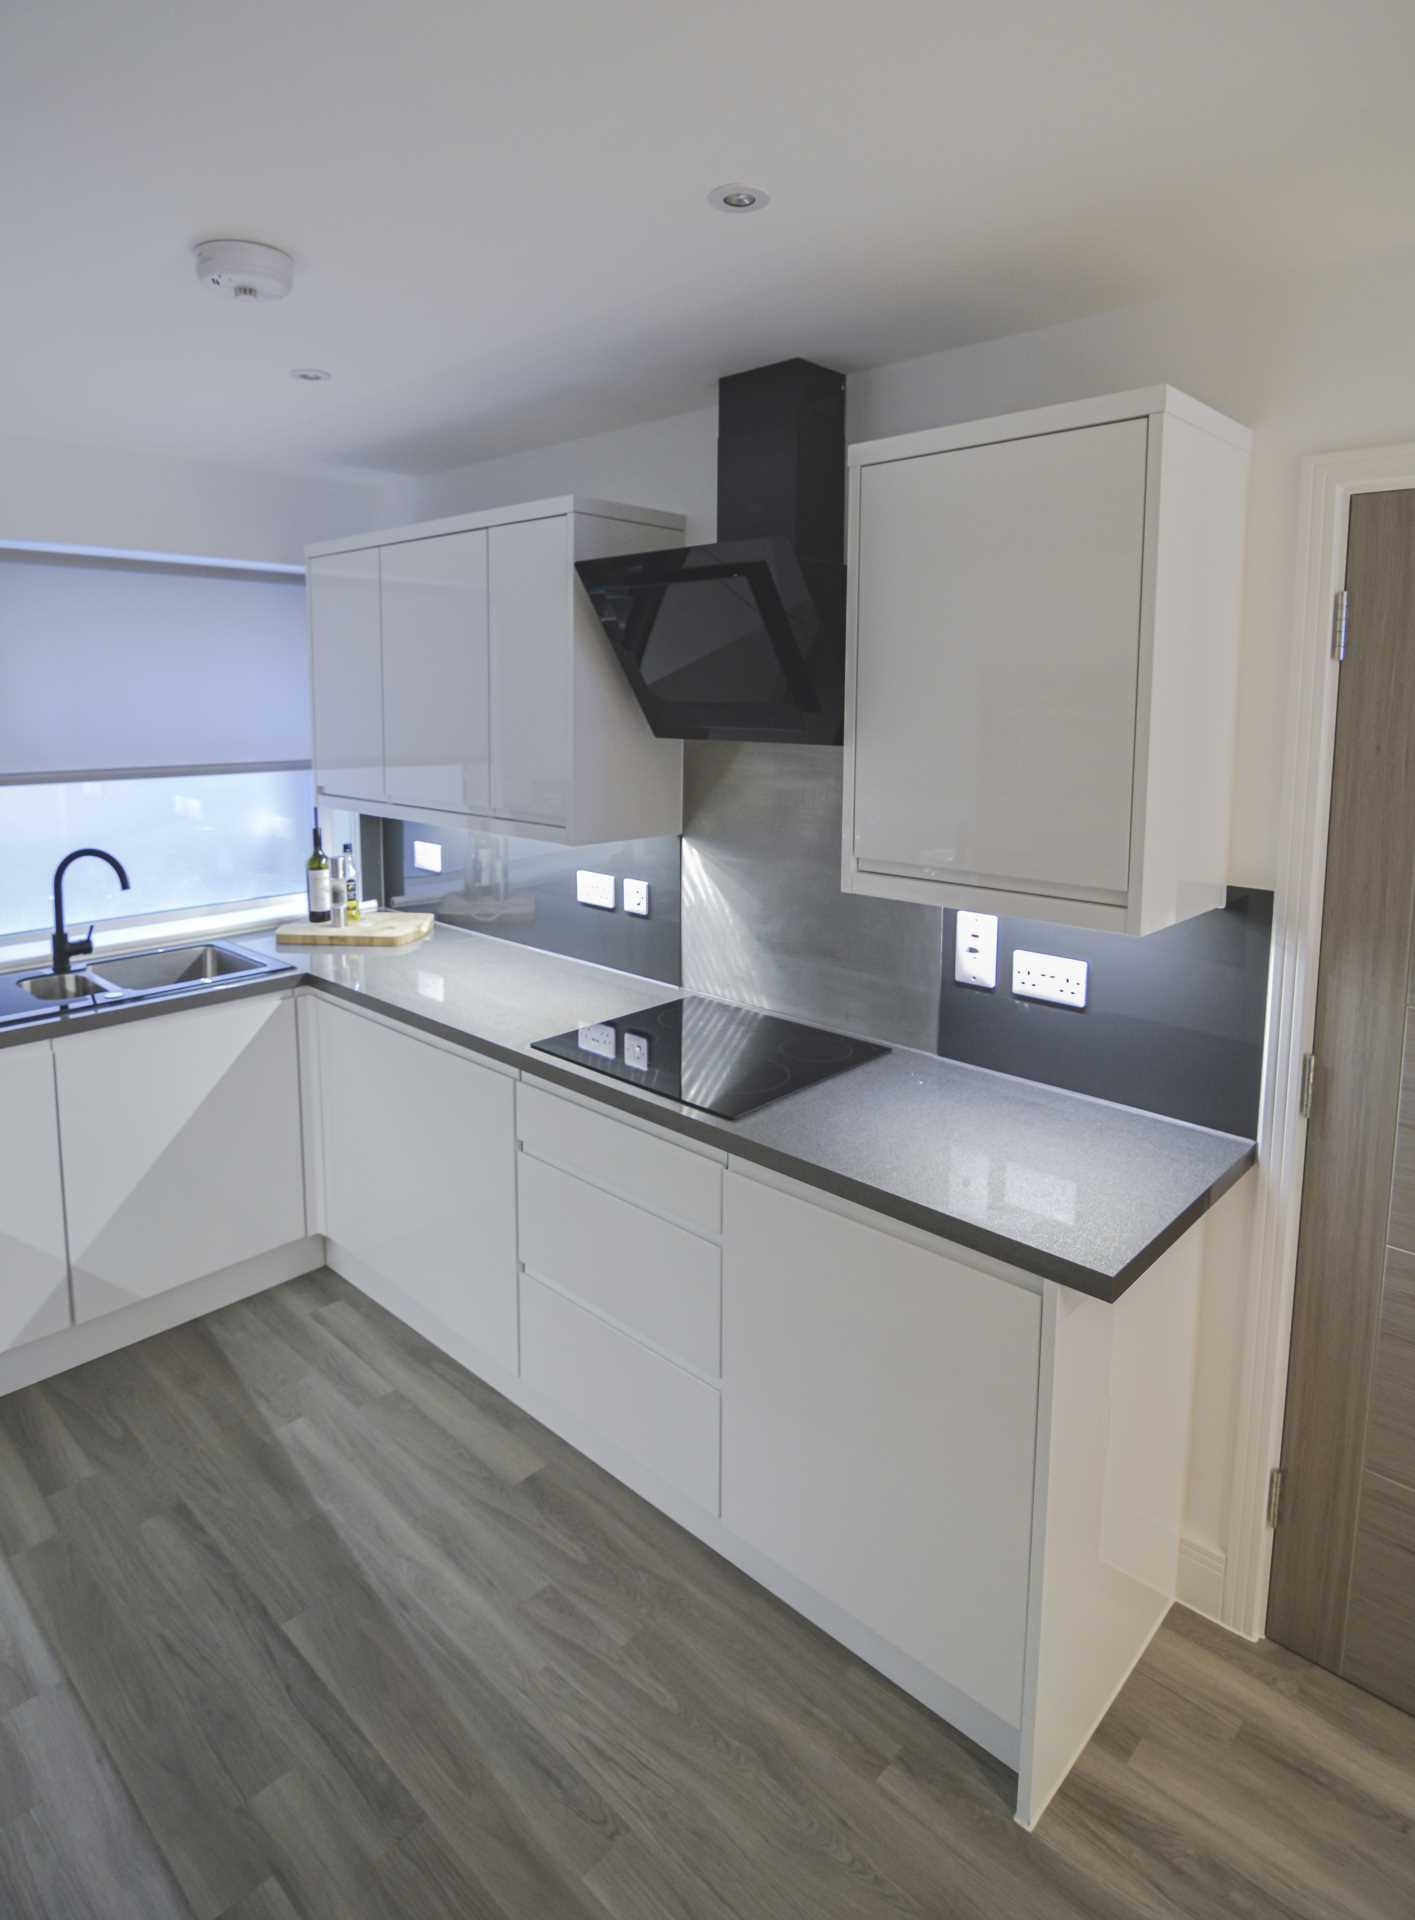 Flat 6, Waterloo Apartments, Image 5